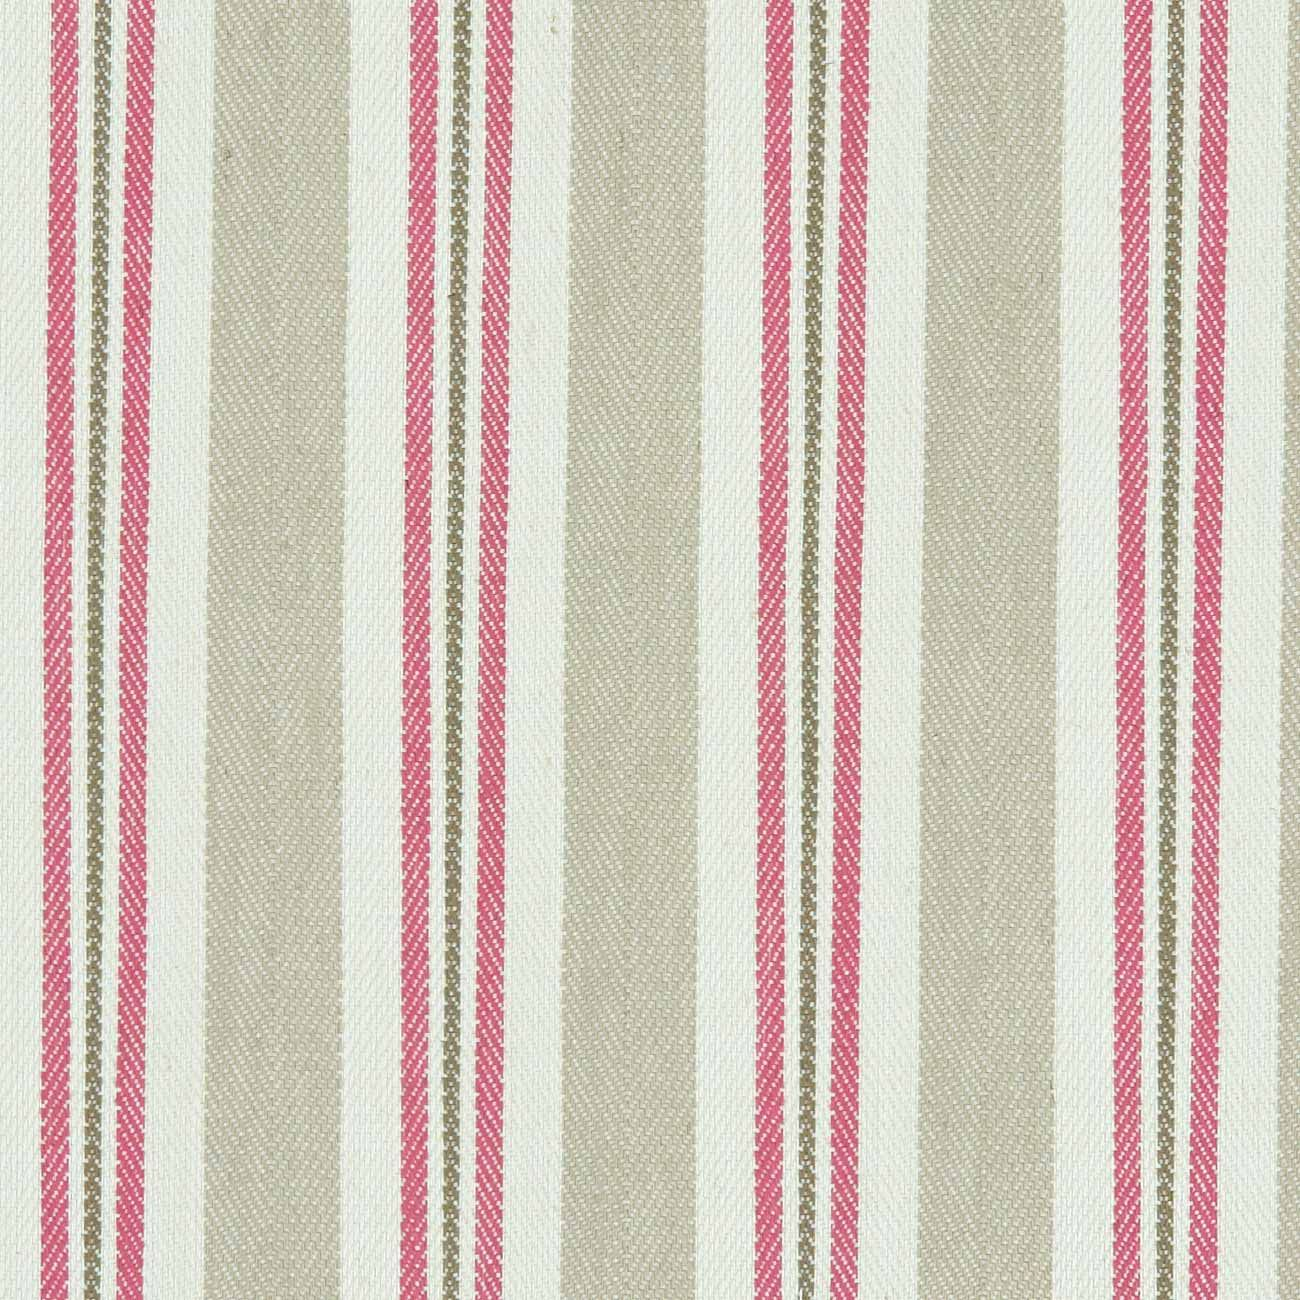 Alderton Raspberry Linen (Premier)